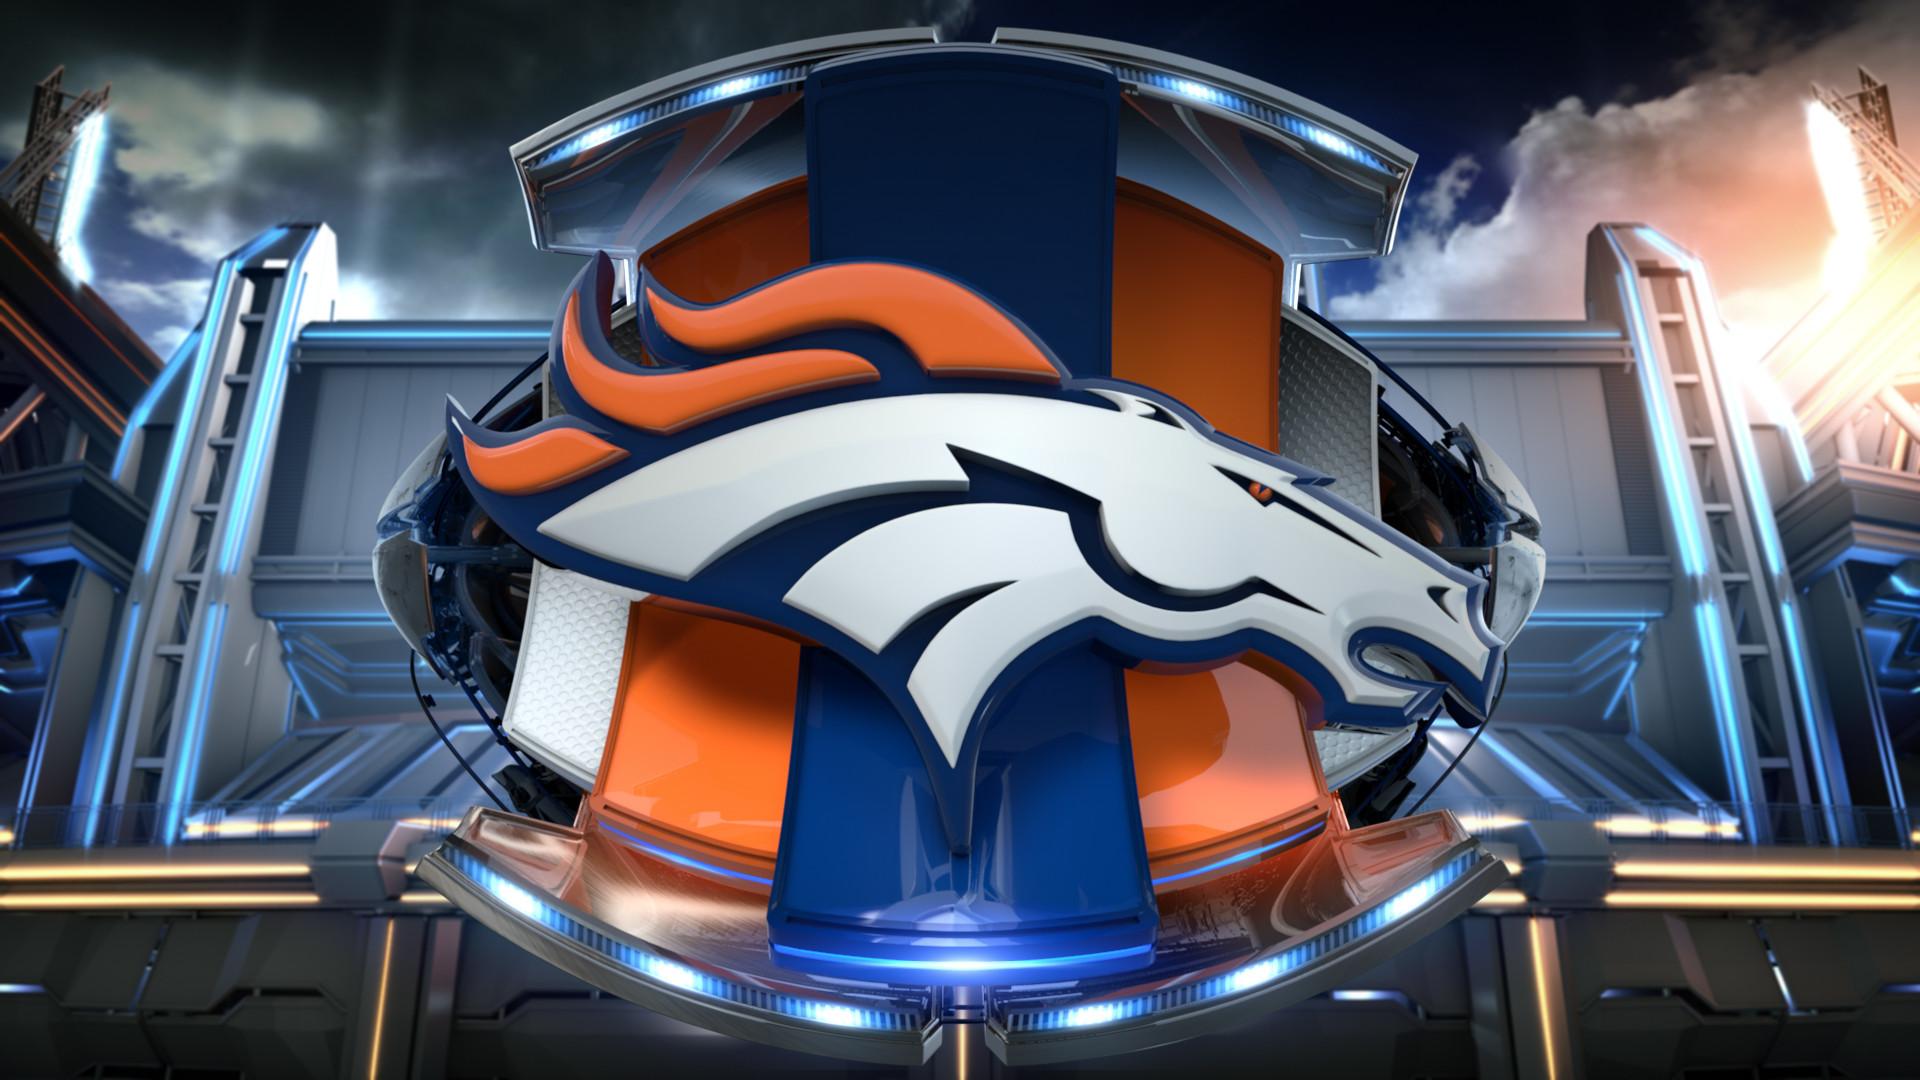 Res: 1920x1080, Denver Broncos Wallpaper HD Download Free | PixelsTalk.Net src